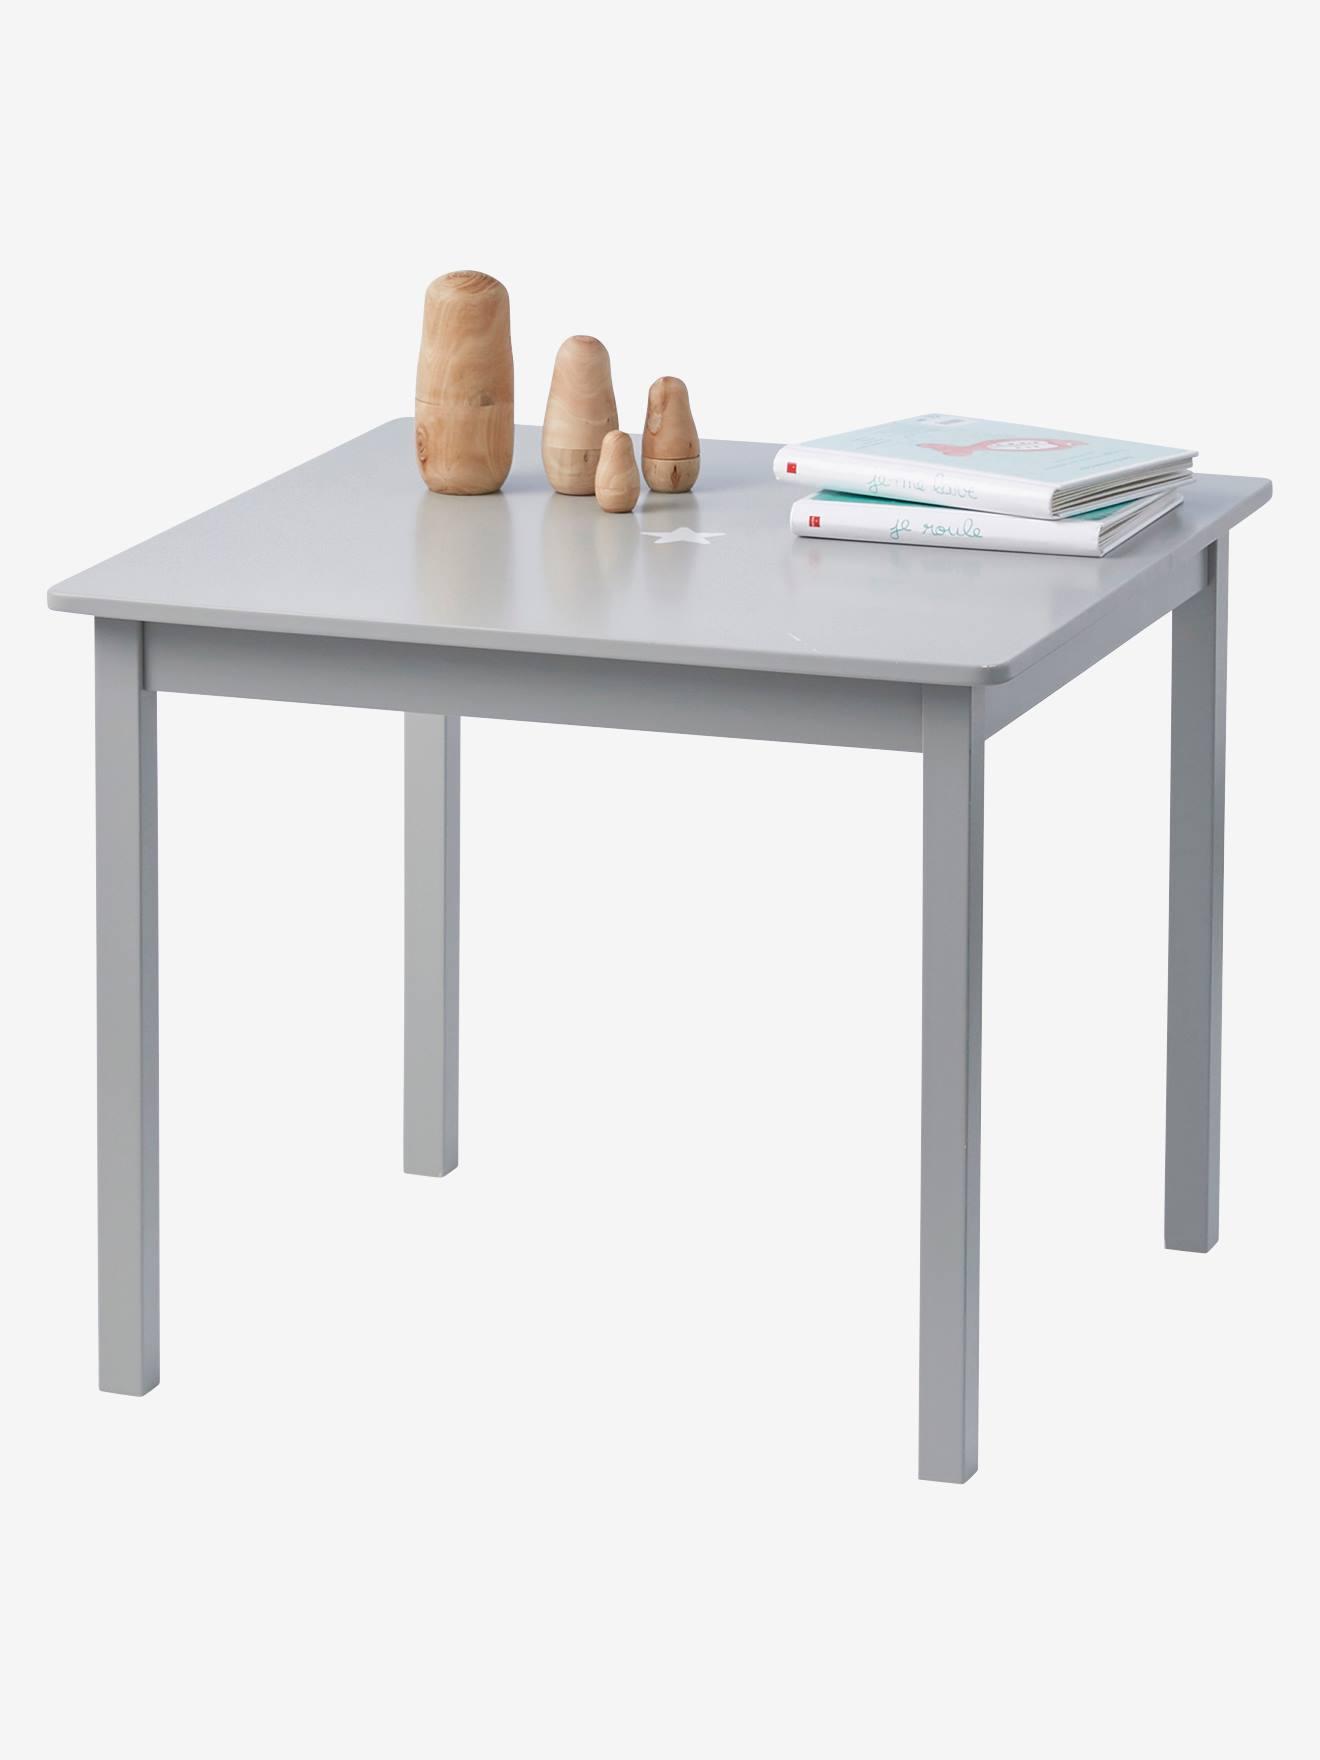 Ordinaire Sirius Childrensu0027 Play Table GREY MEDIUM SOLID+WHITE LIGHT SOLID